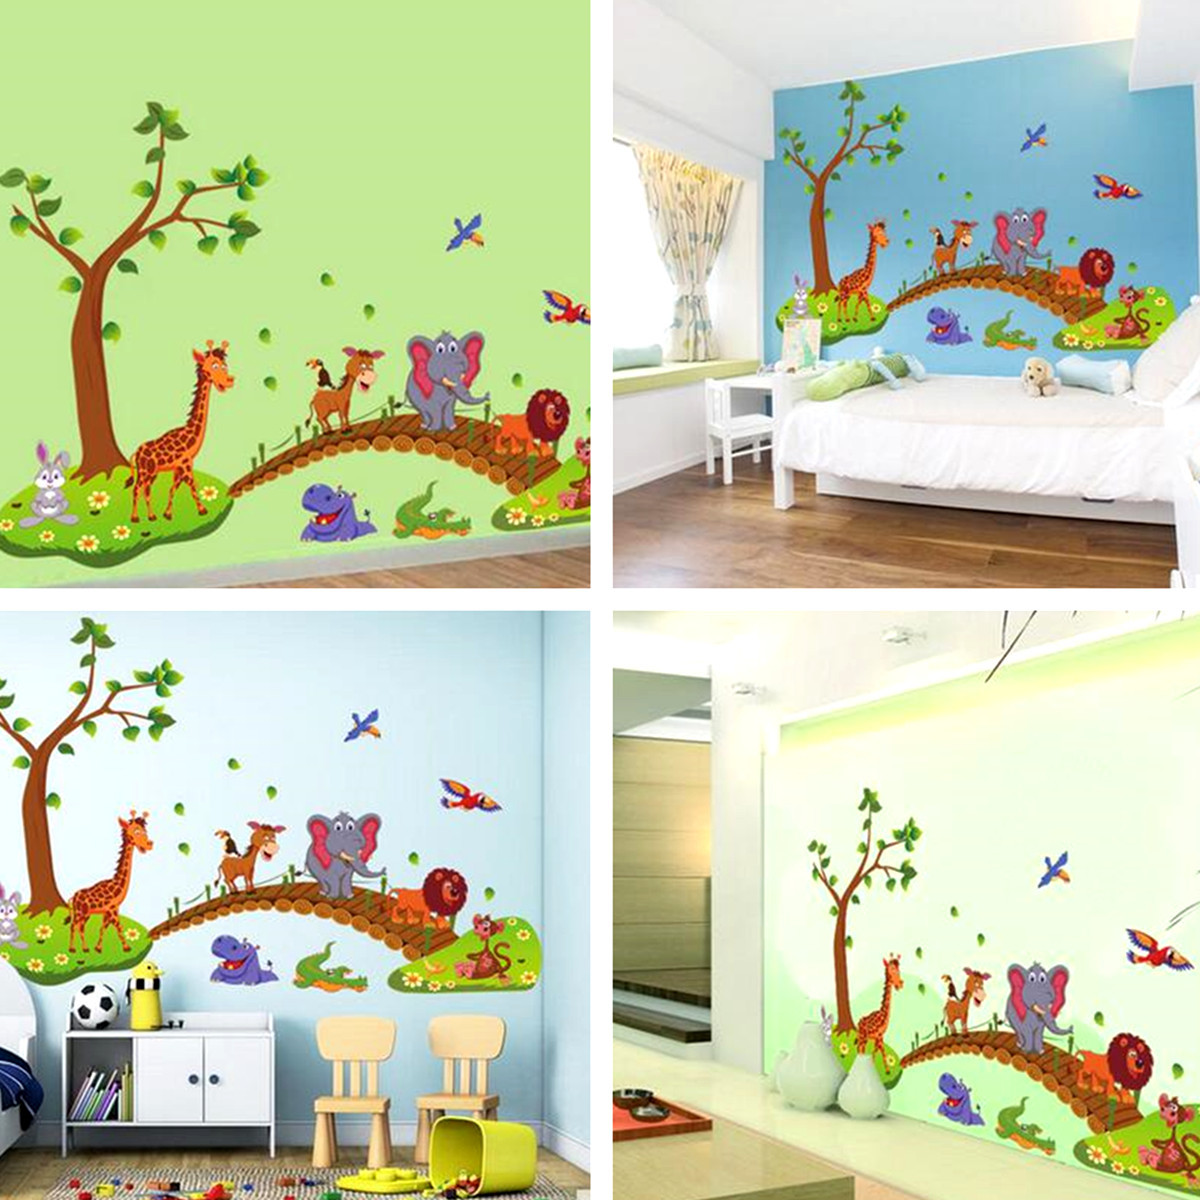 Cartoon animal removable wall sticker kids nursery home for Diy tree mural nursery